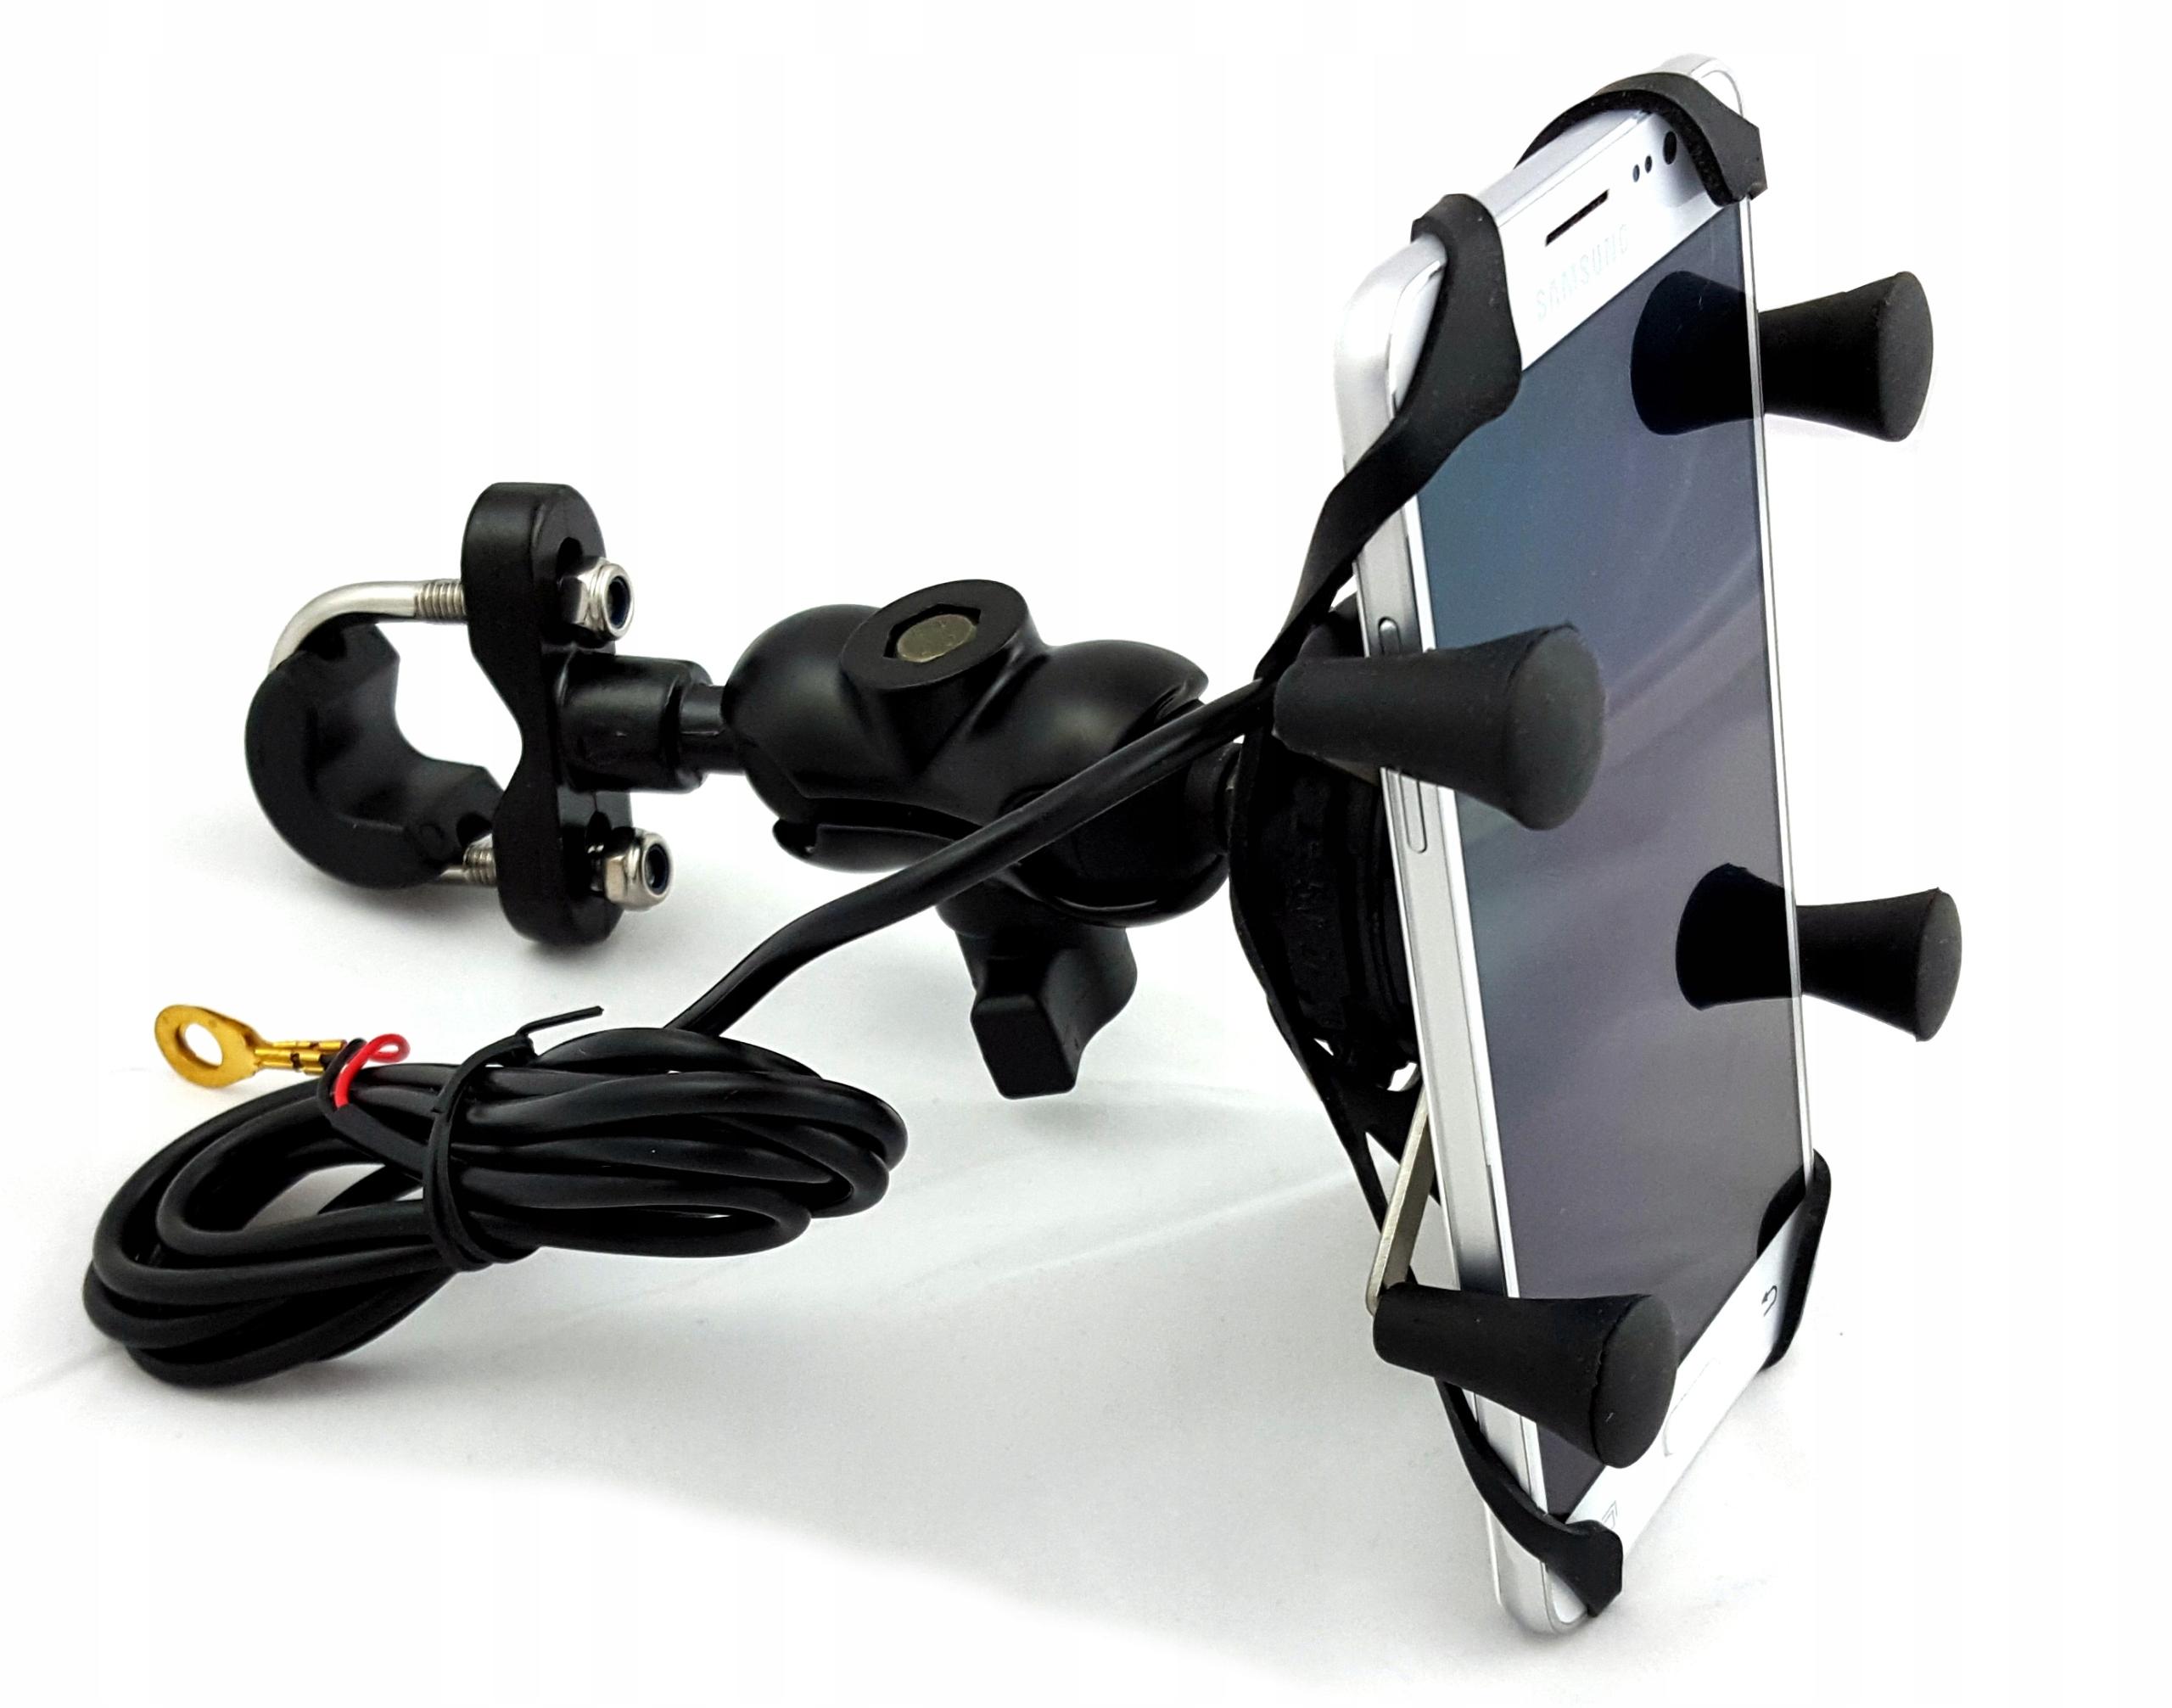 MOTOCYKLOWY UCHWYT RAM NA TELEFON LUSTERKO ON OFF